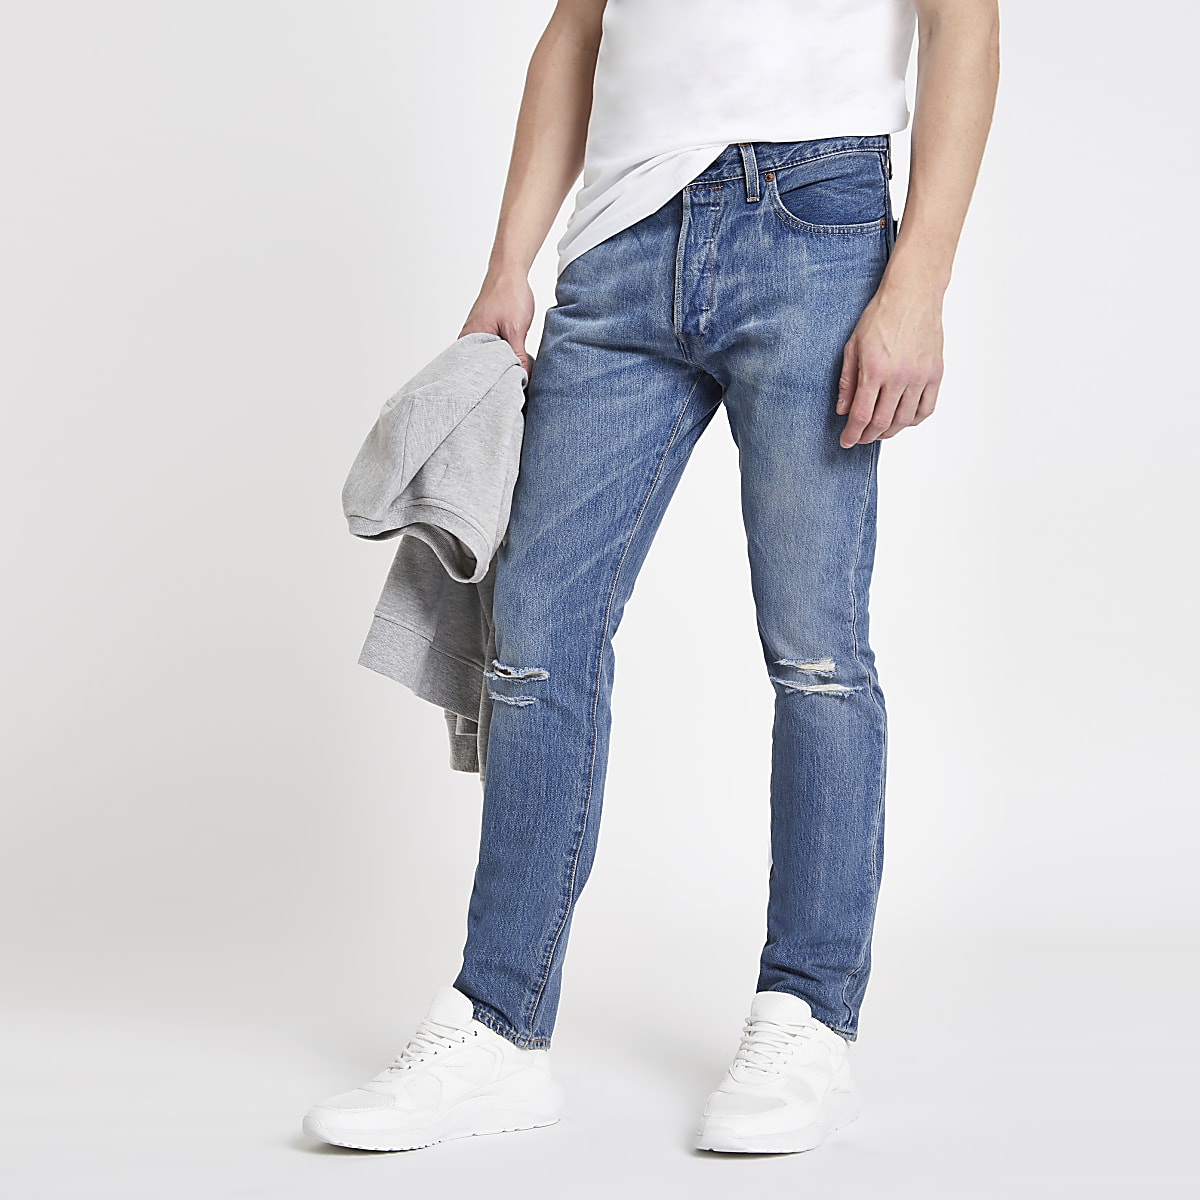 Levi's – 501 – Hellblaue Skinny Jeans